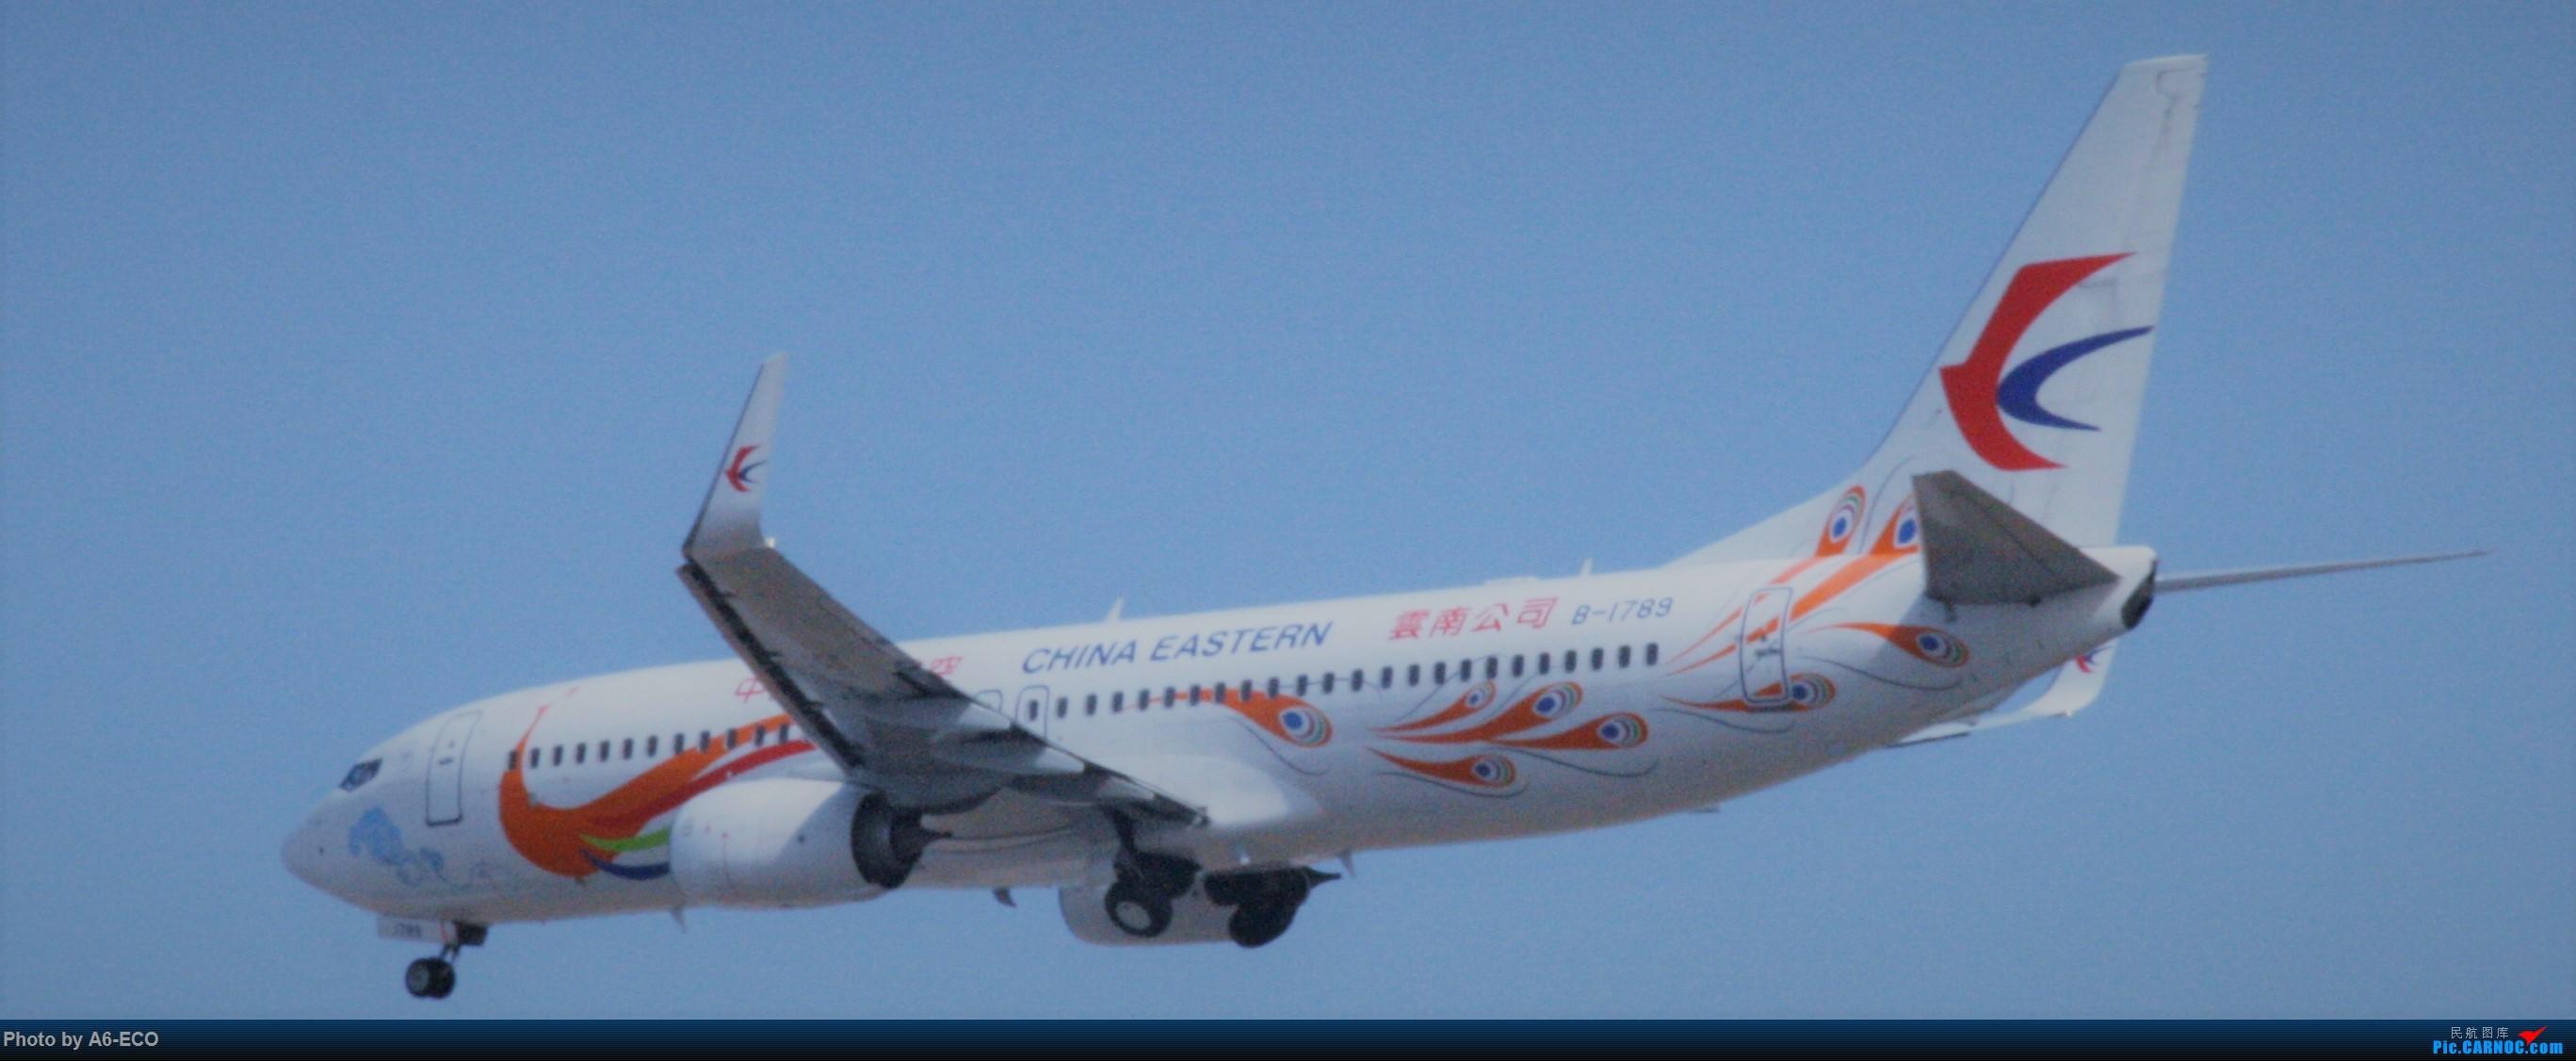 Re:[原创]今天运气极好,云南孔雀,B-1070,2个菜航邮戳,泡菜航彩绘,东航邮戳...... BOEING 737-800 B-1789 中国北京首都国际机场